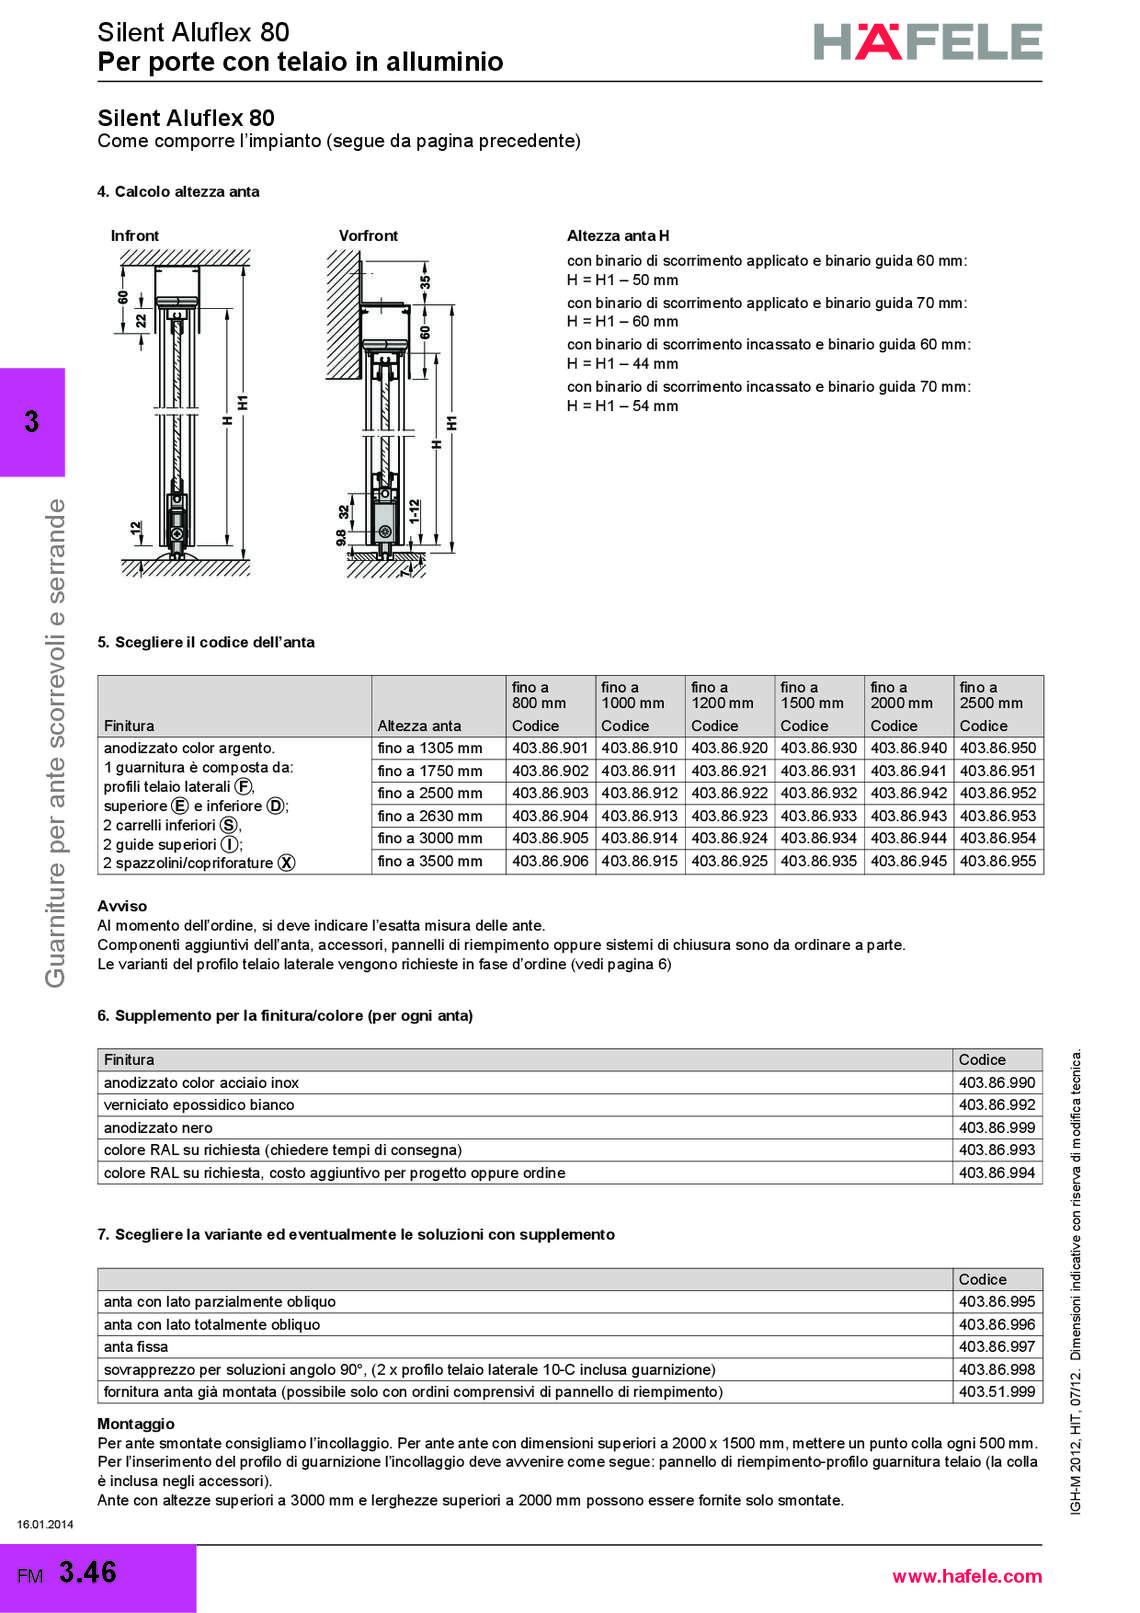 hafele-prodotti-su-misura_81_059.jpg